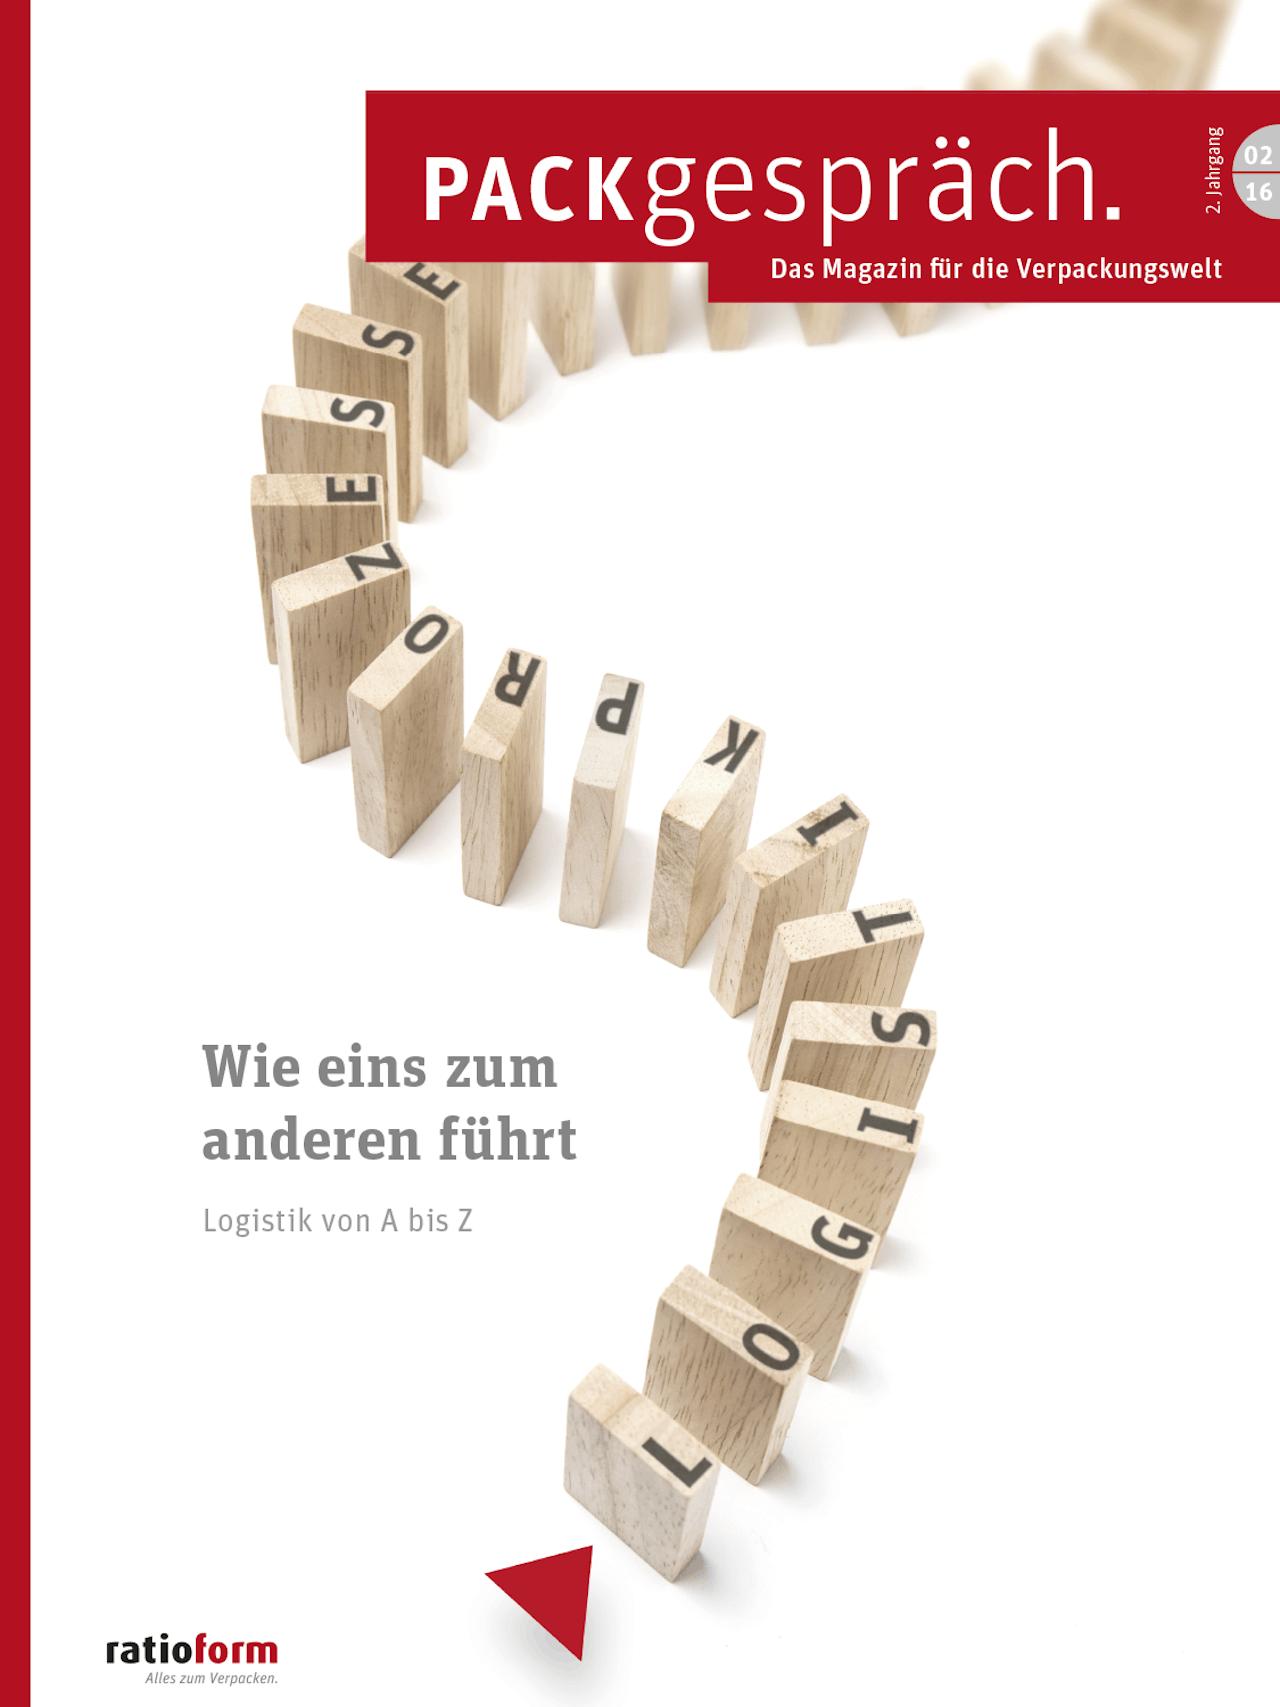 Packgespräch, Magazin Verpackungswelt 02 16